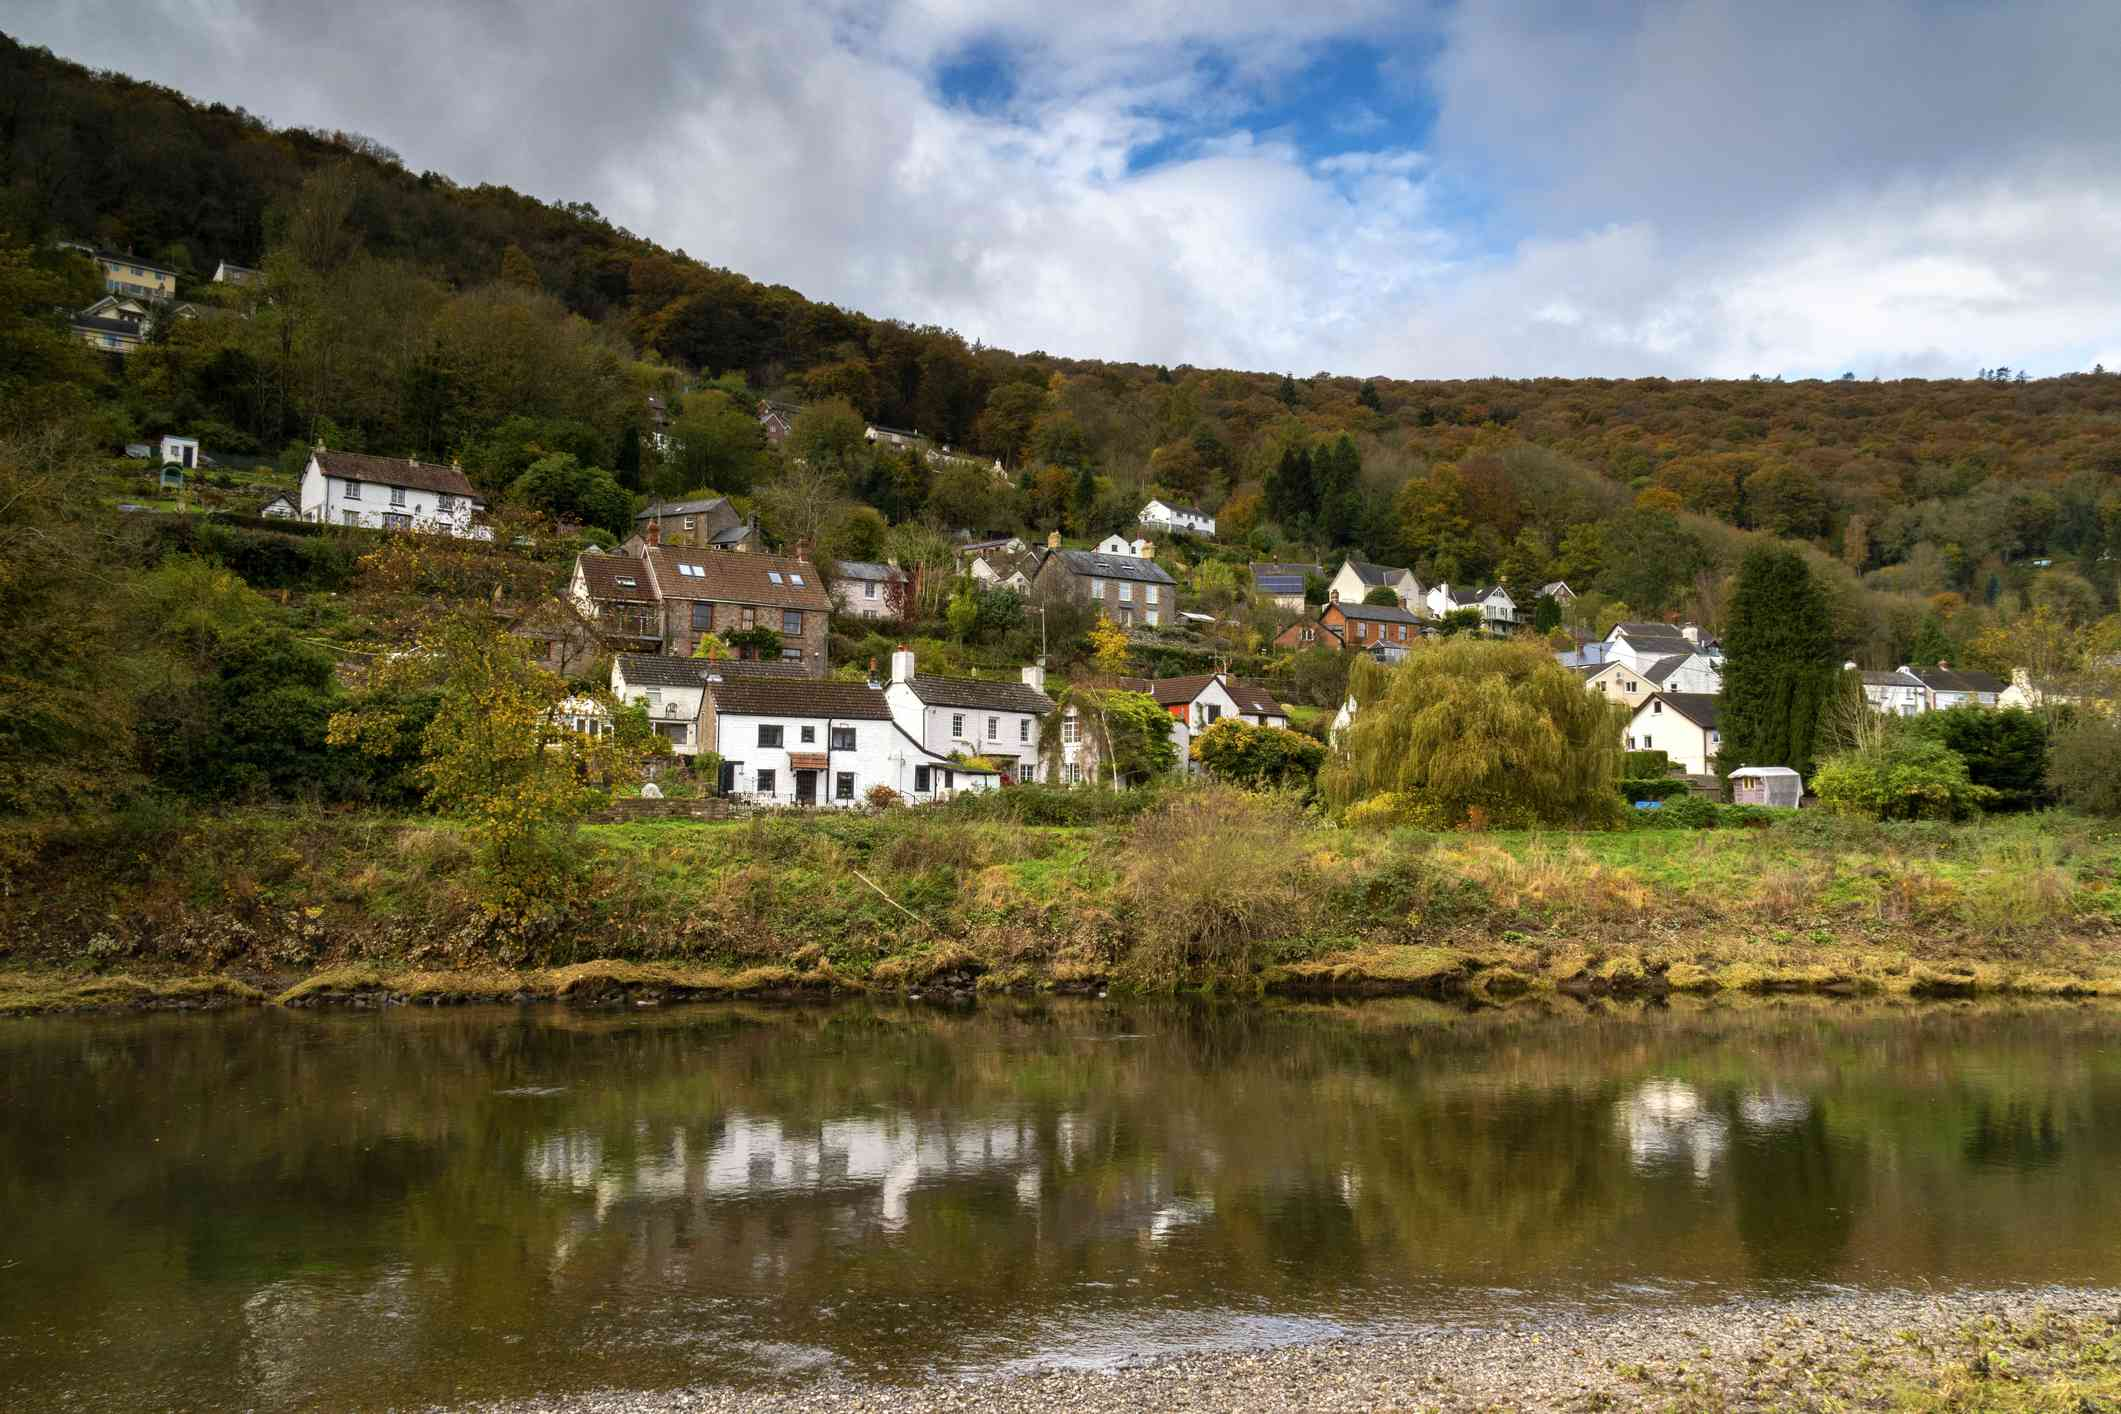 The riverside village of Llandogo in Rye Valley, Wales